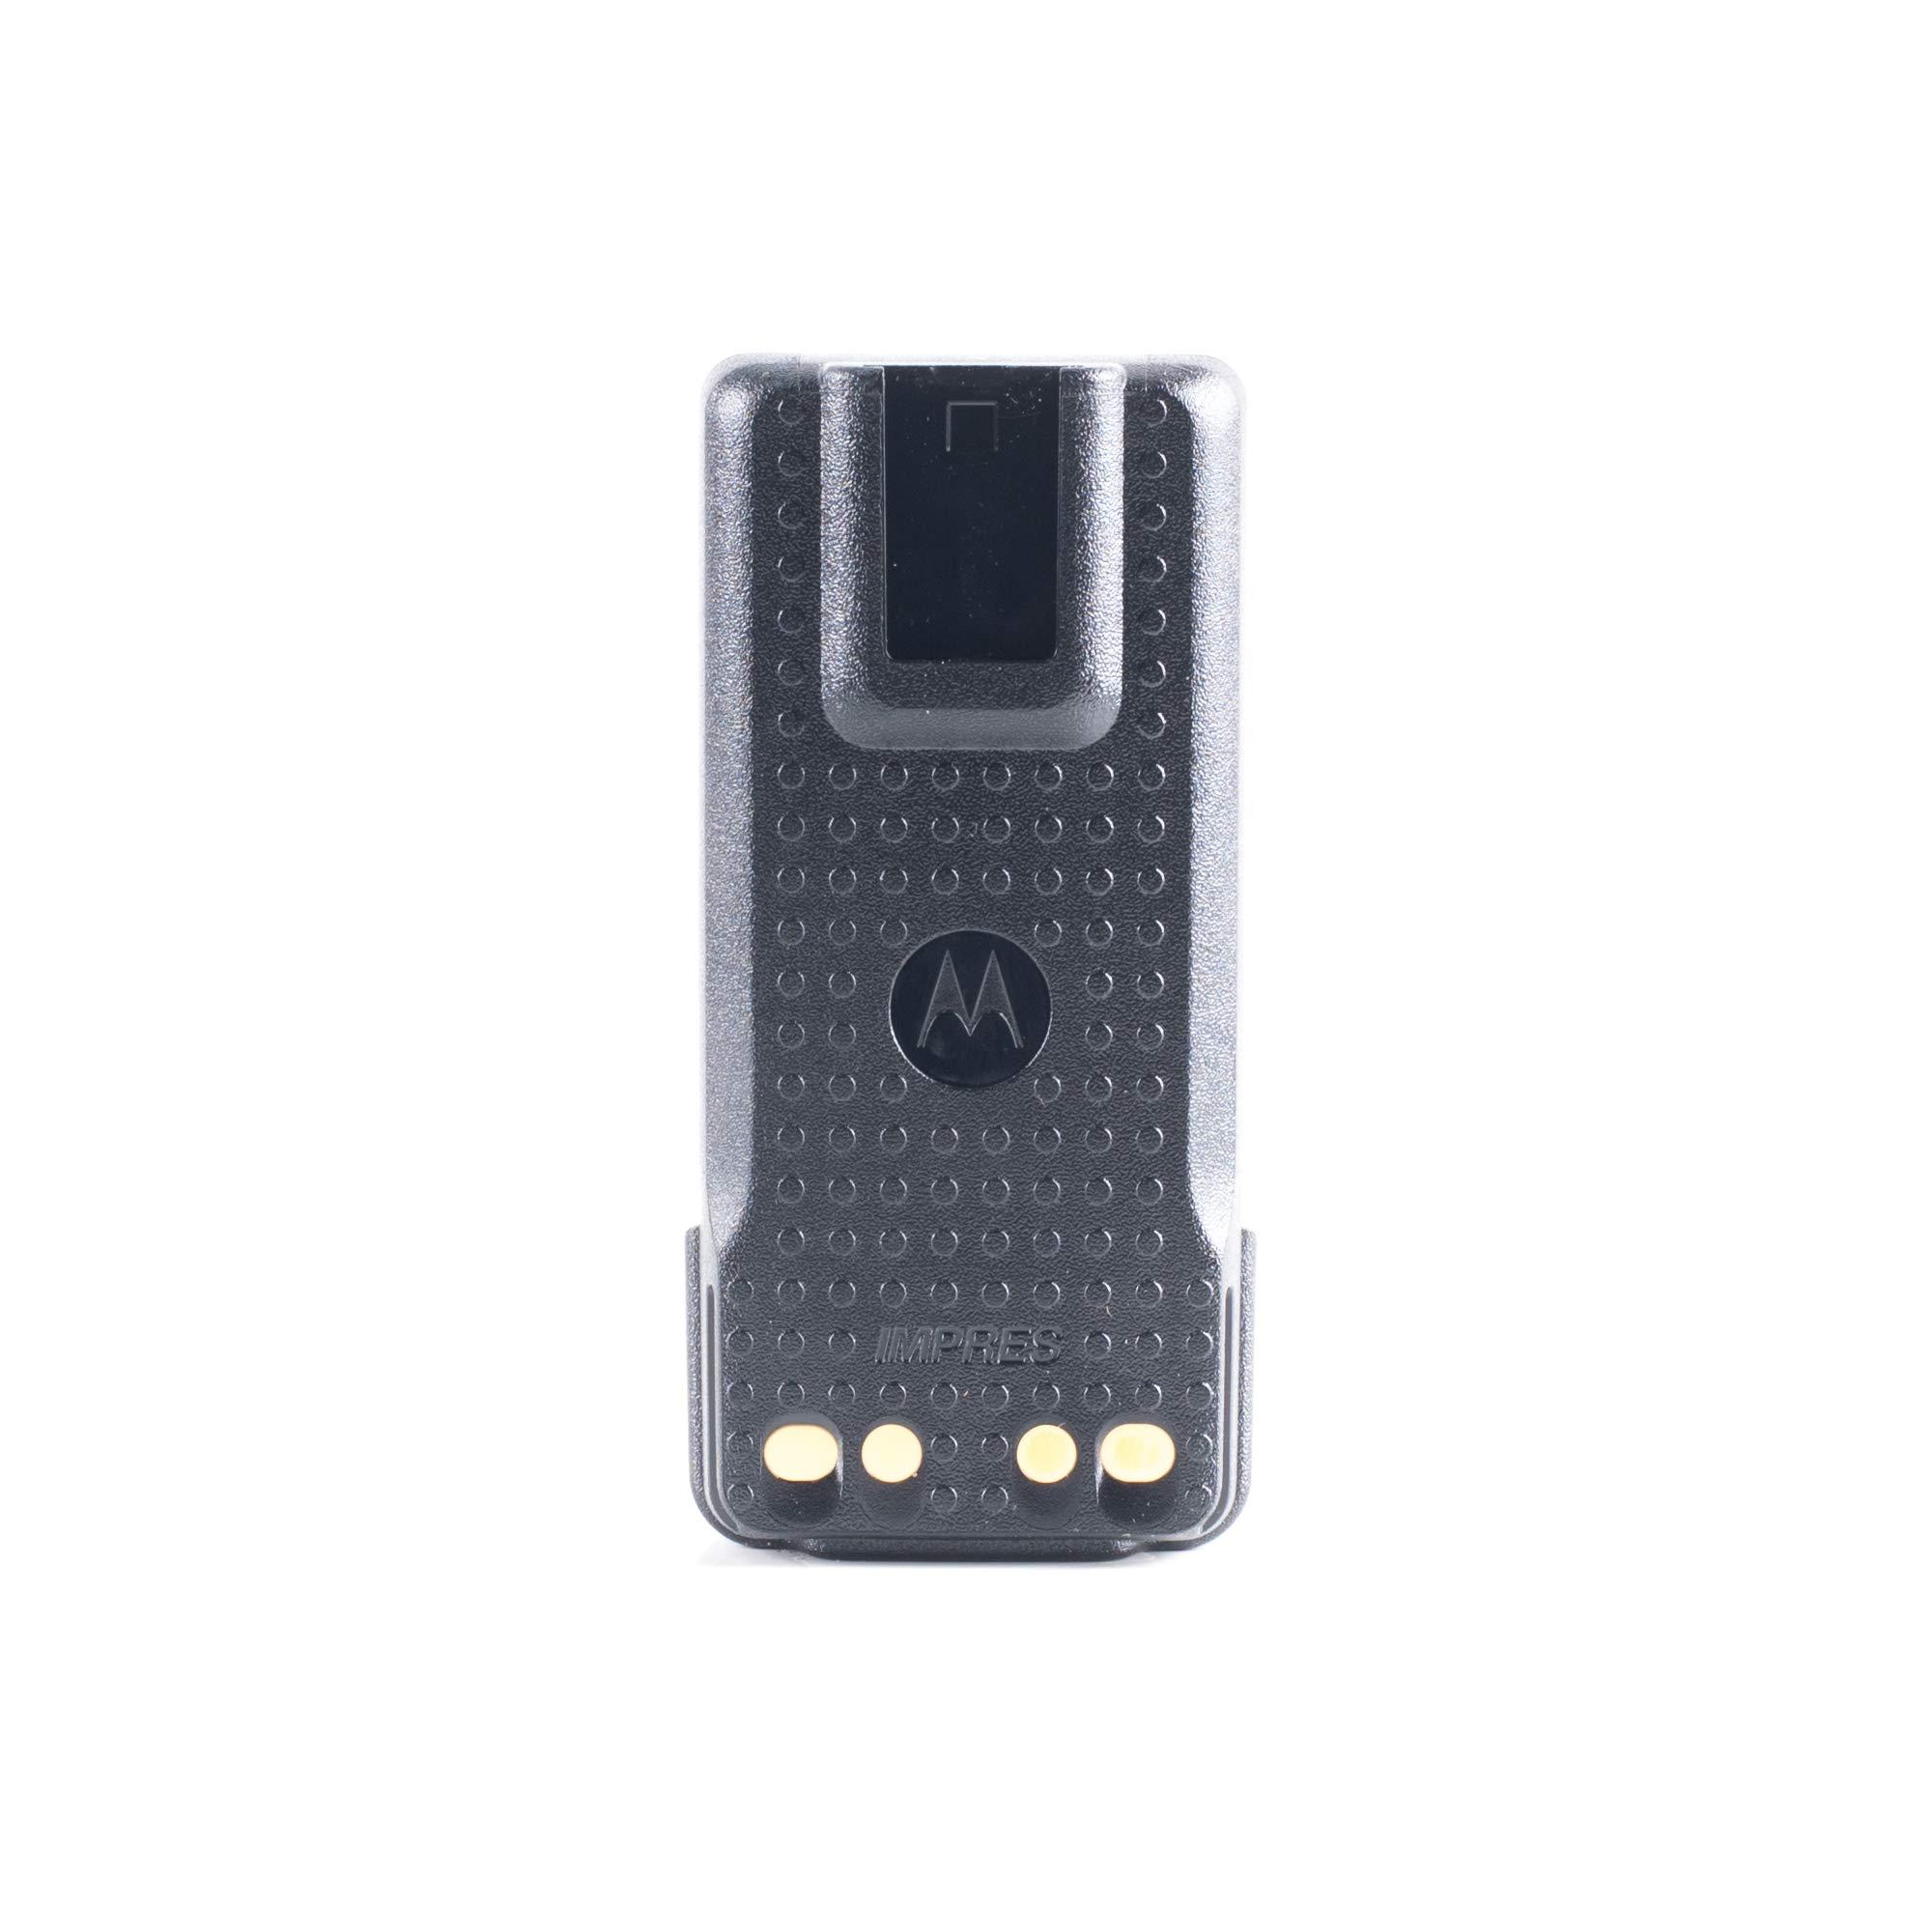 Motorola Solutions PMNN4493A IMPRES 3000 mAh Lithium-Ion Battery